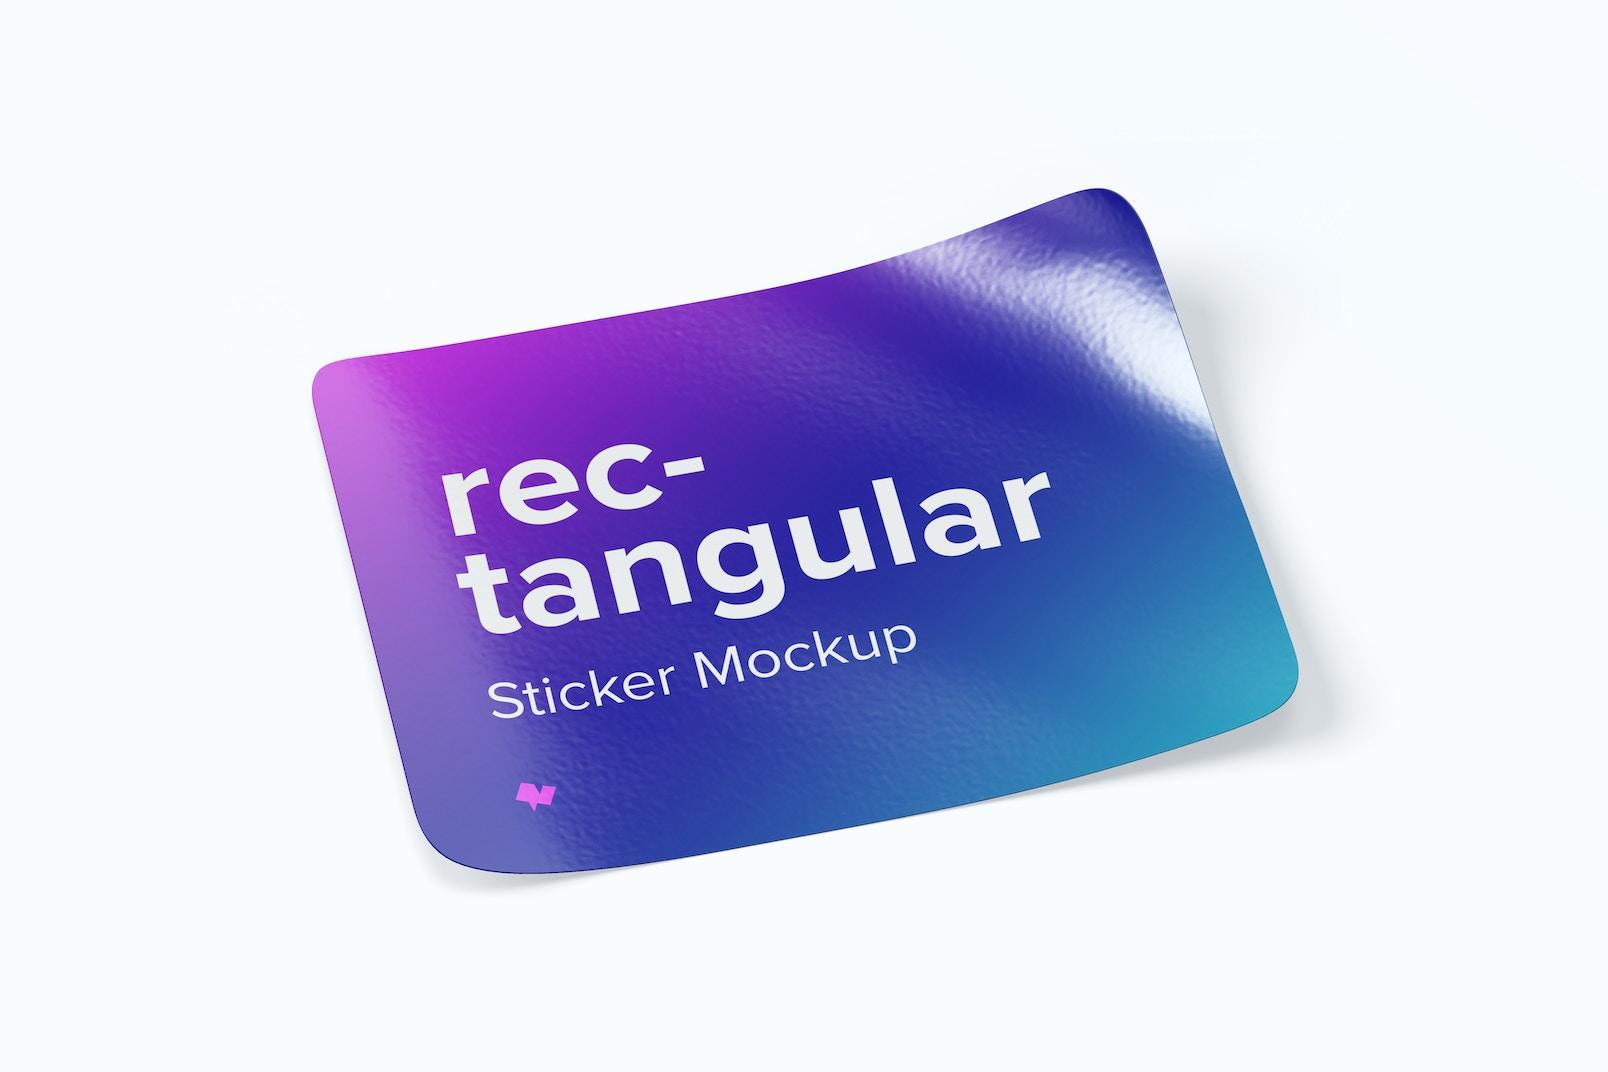 Rectangular Sticker Mockup, Left View